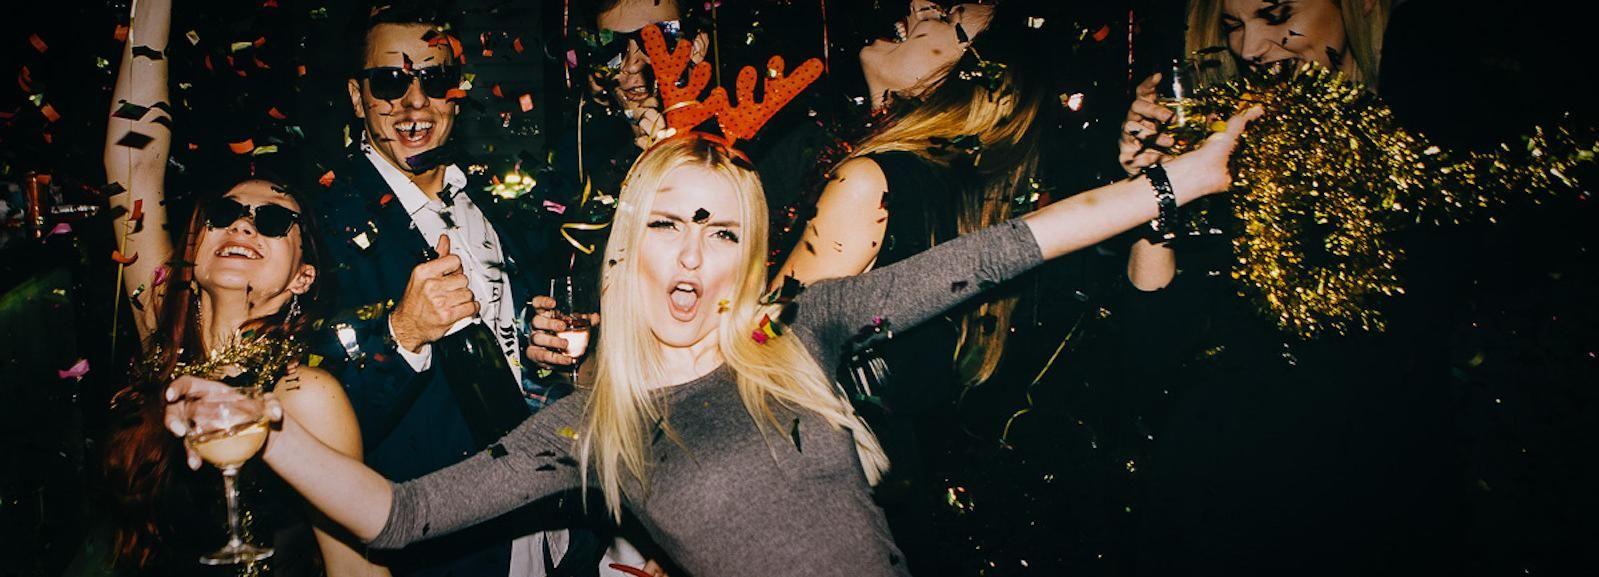 Prague: New Year's Eve Pub Crawl